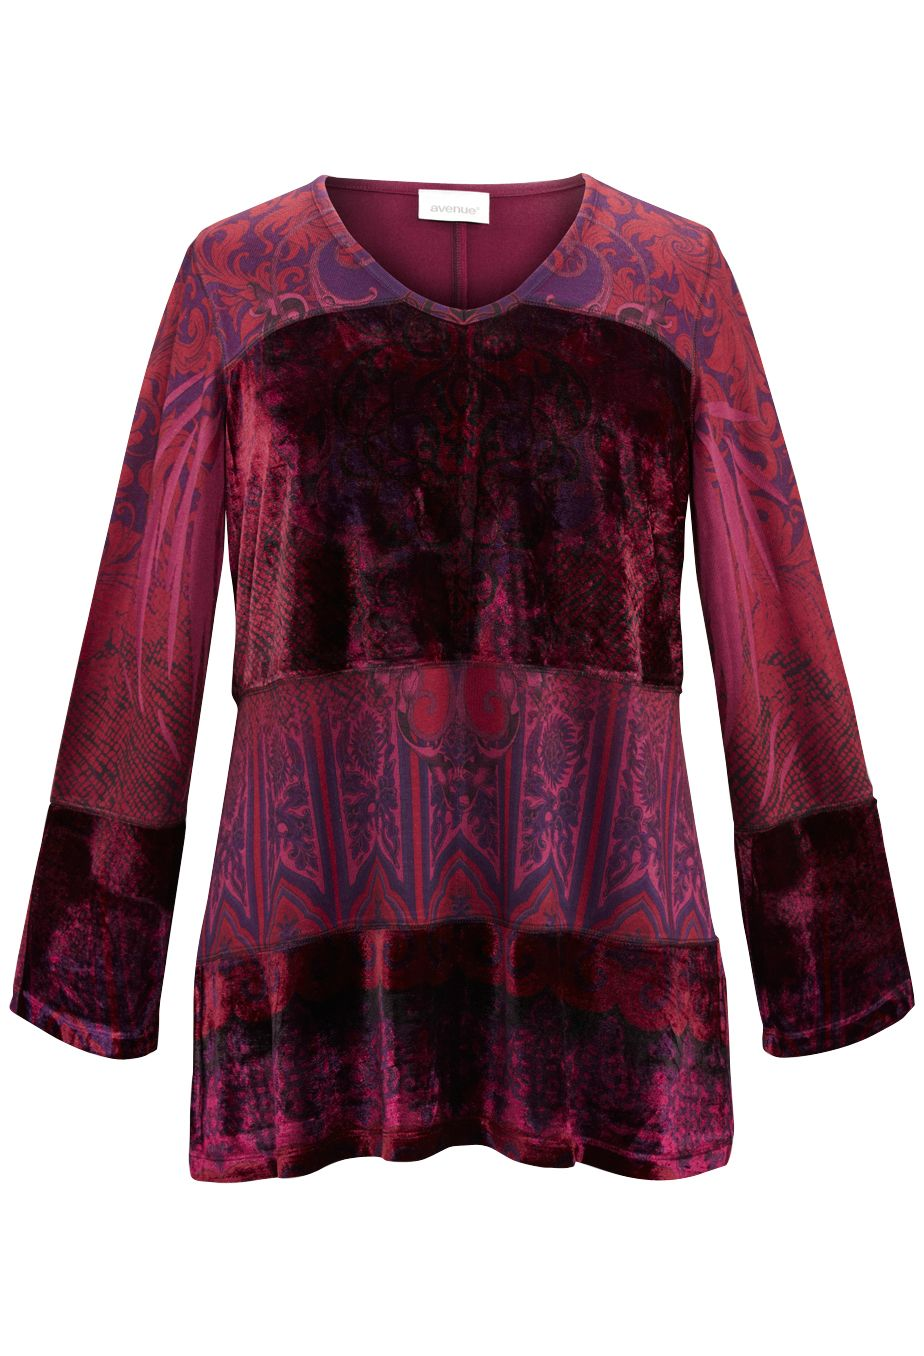 Plus Size Burgundy Velour Tunic Top Plus Size Tunics Avenue